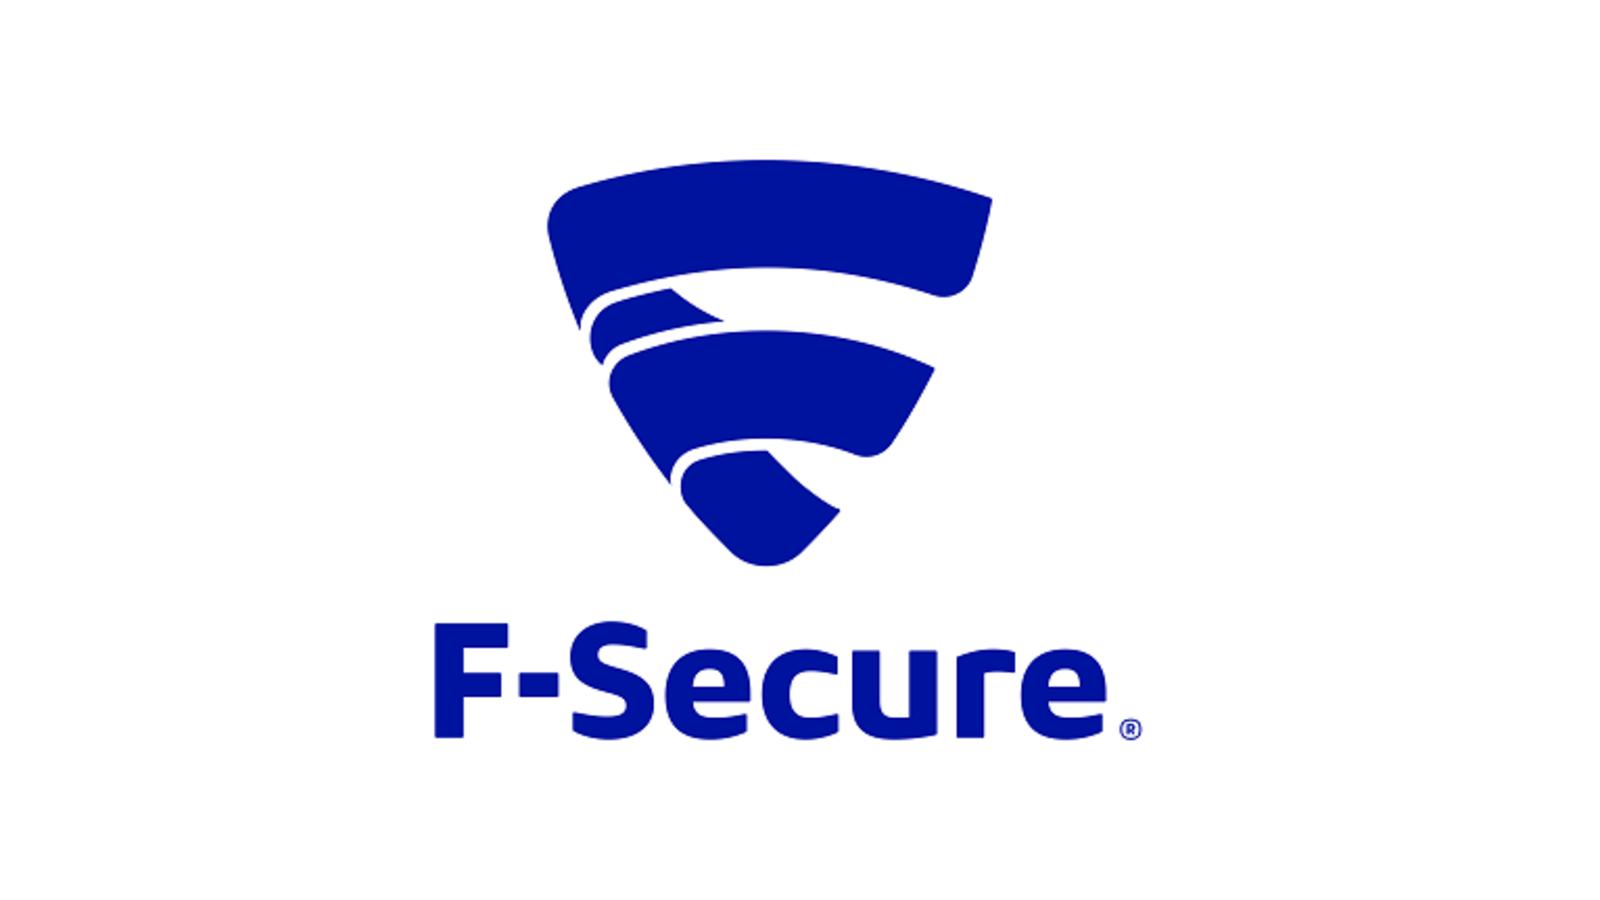 F-Secure finds major vulnerabilities in popular wireless presentation system